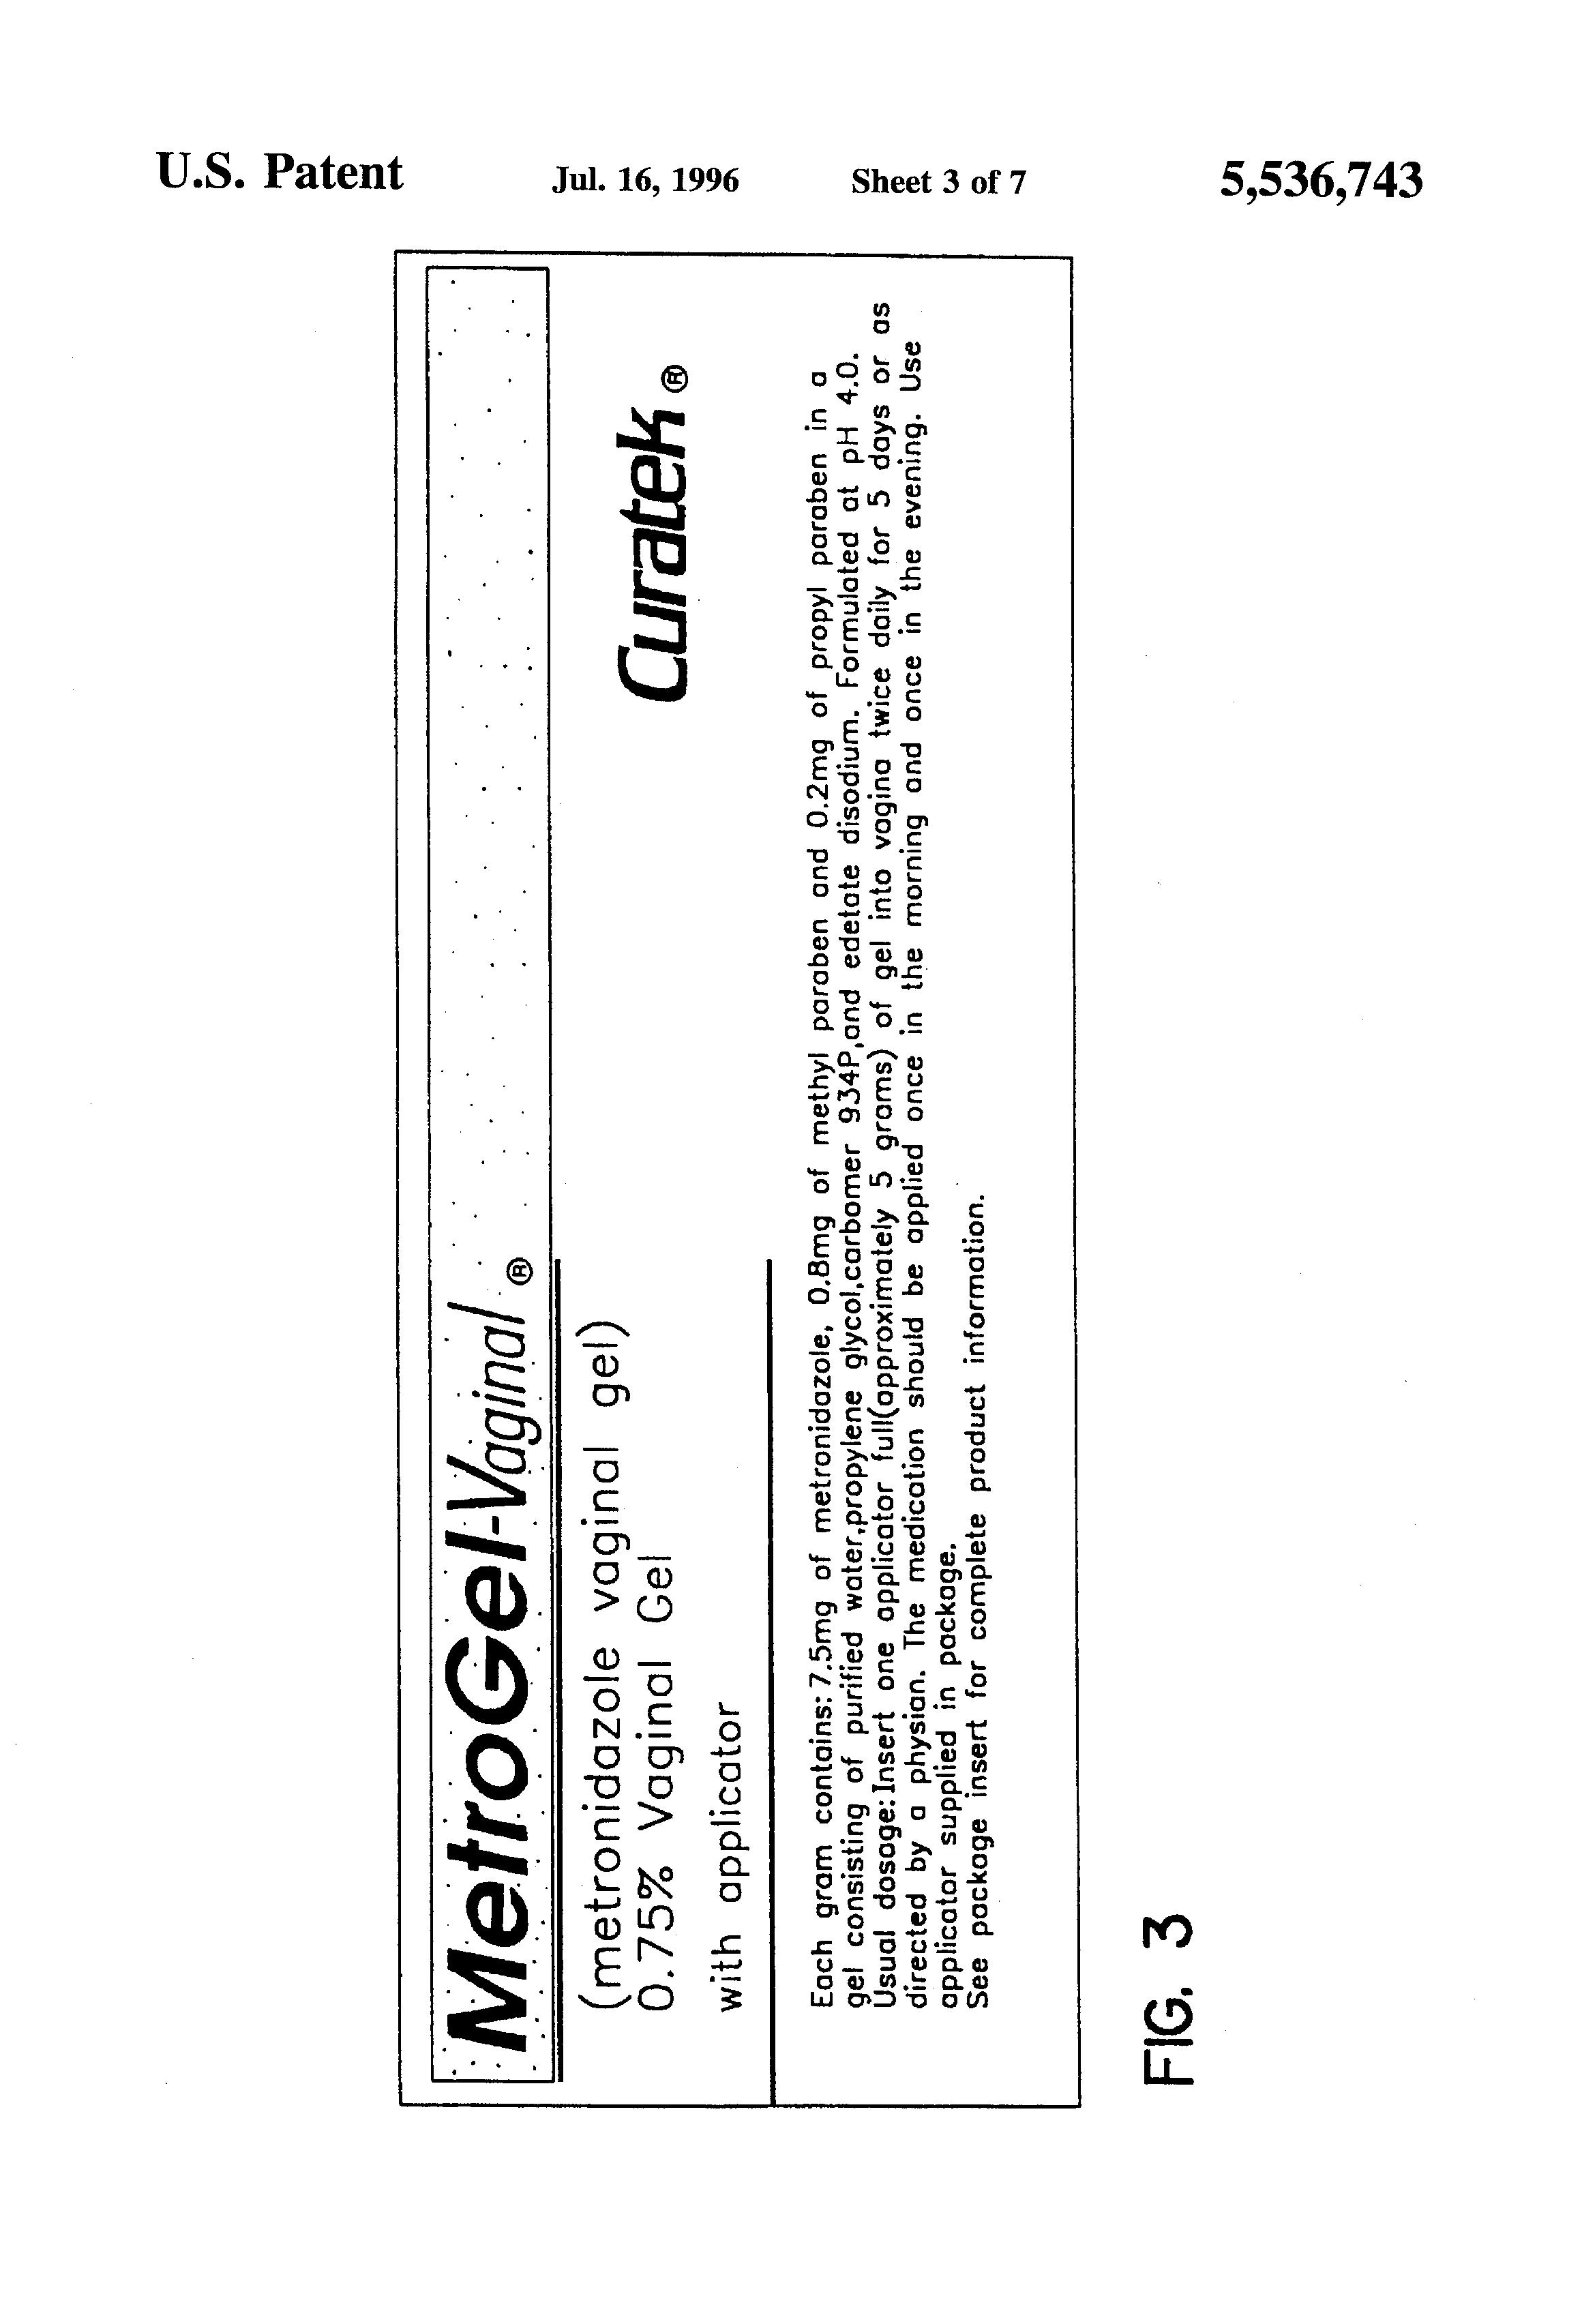 plavix aspirin